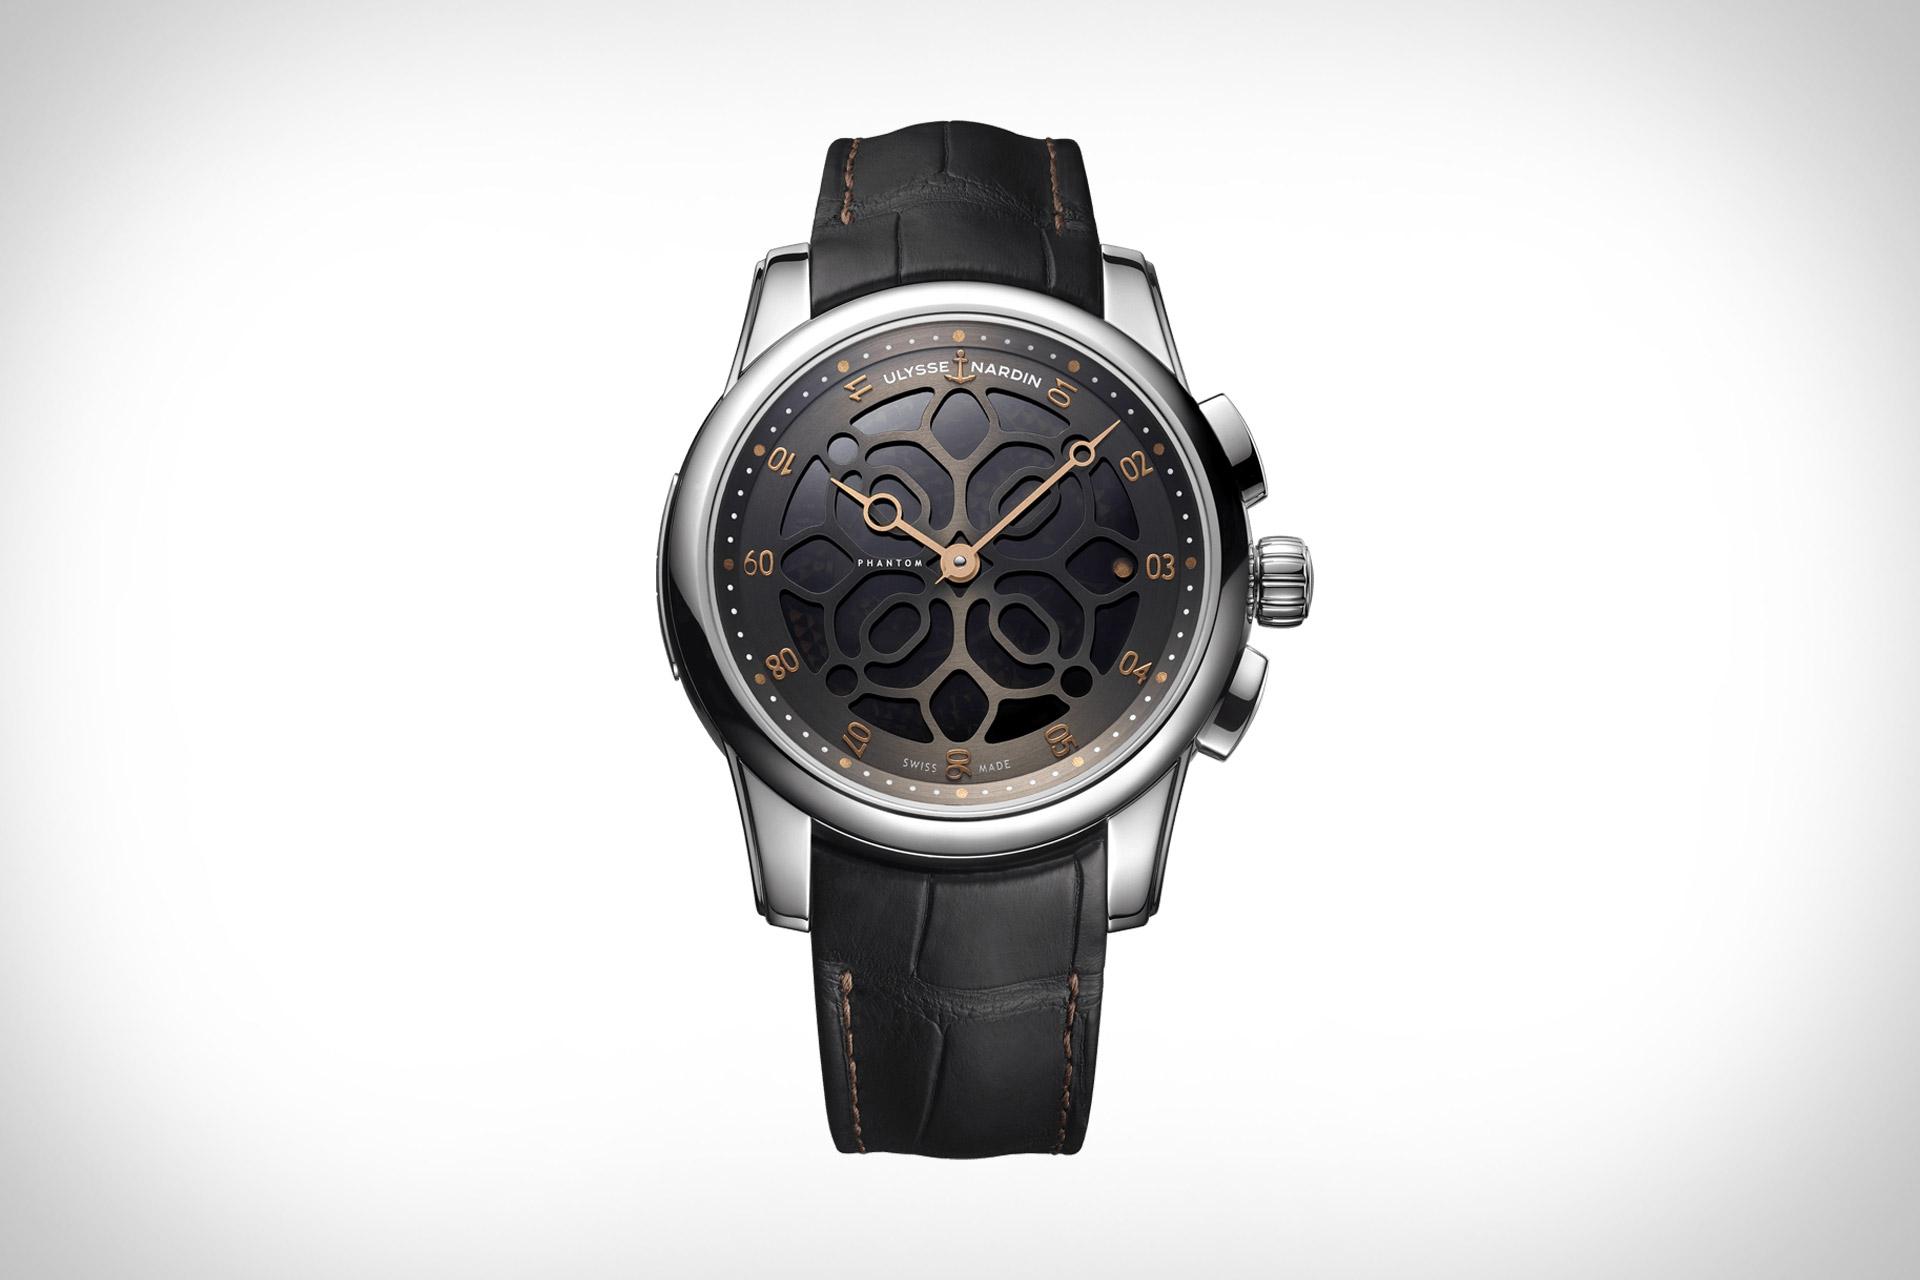 Ulysse Nardin x Devialet Hourstriker Phantom Watch